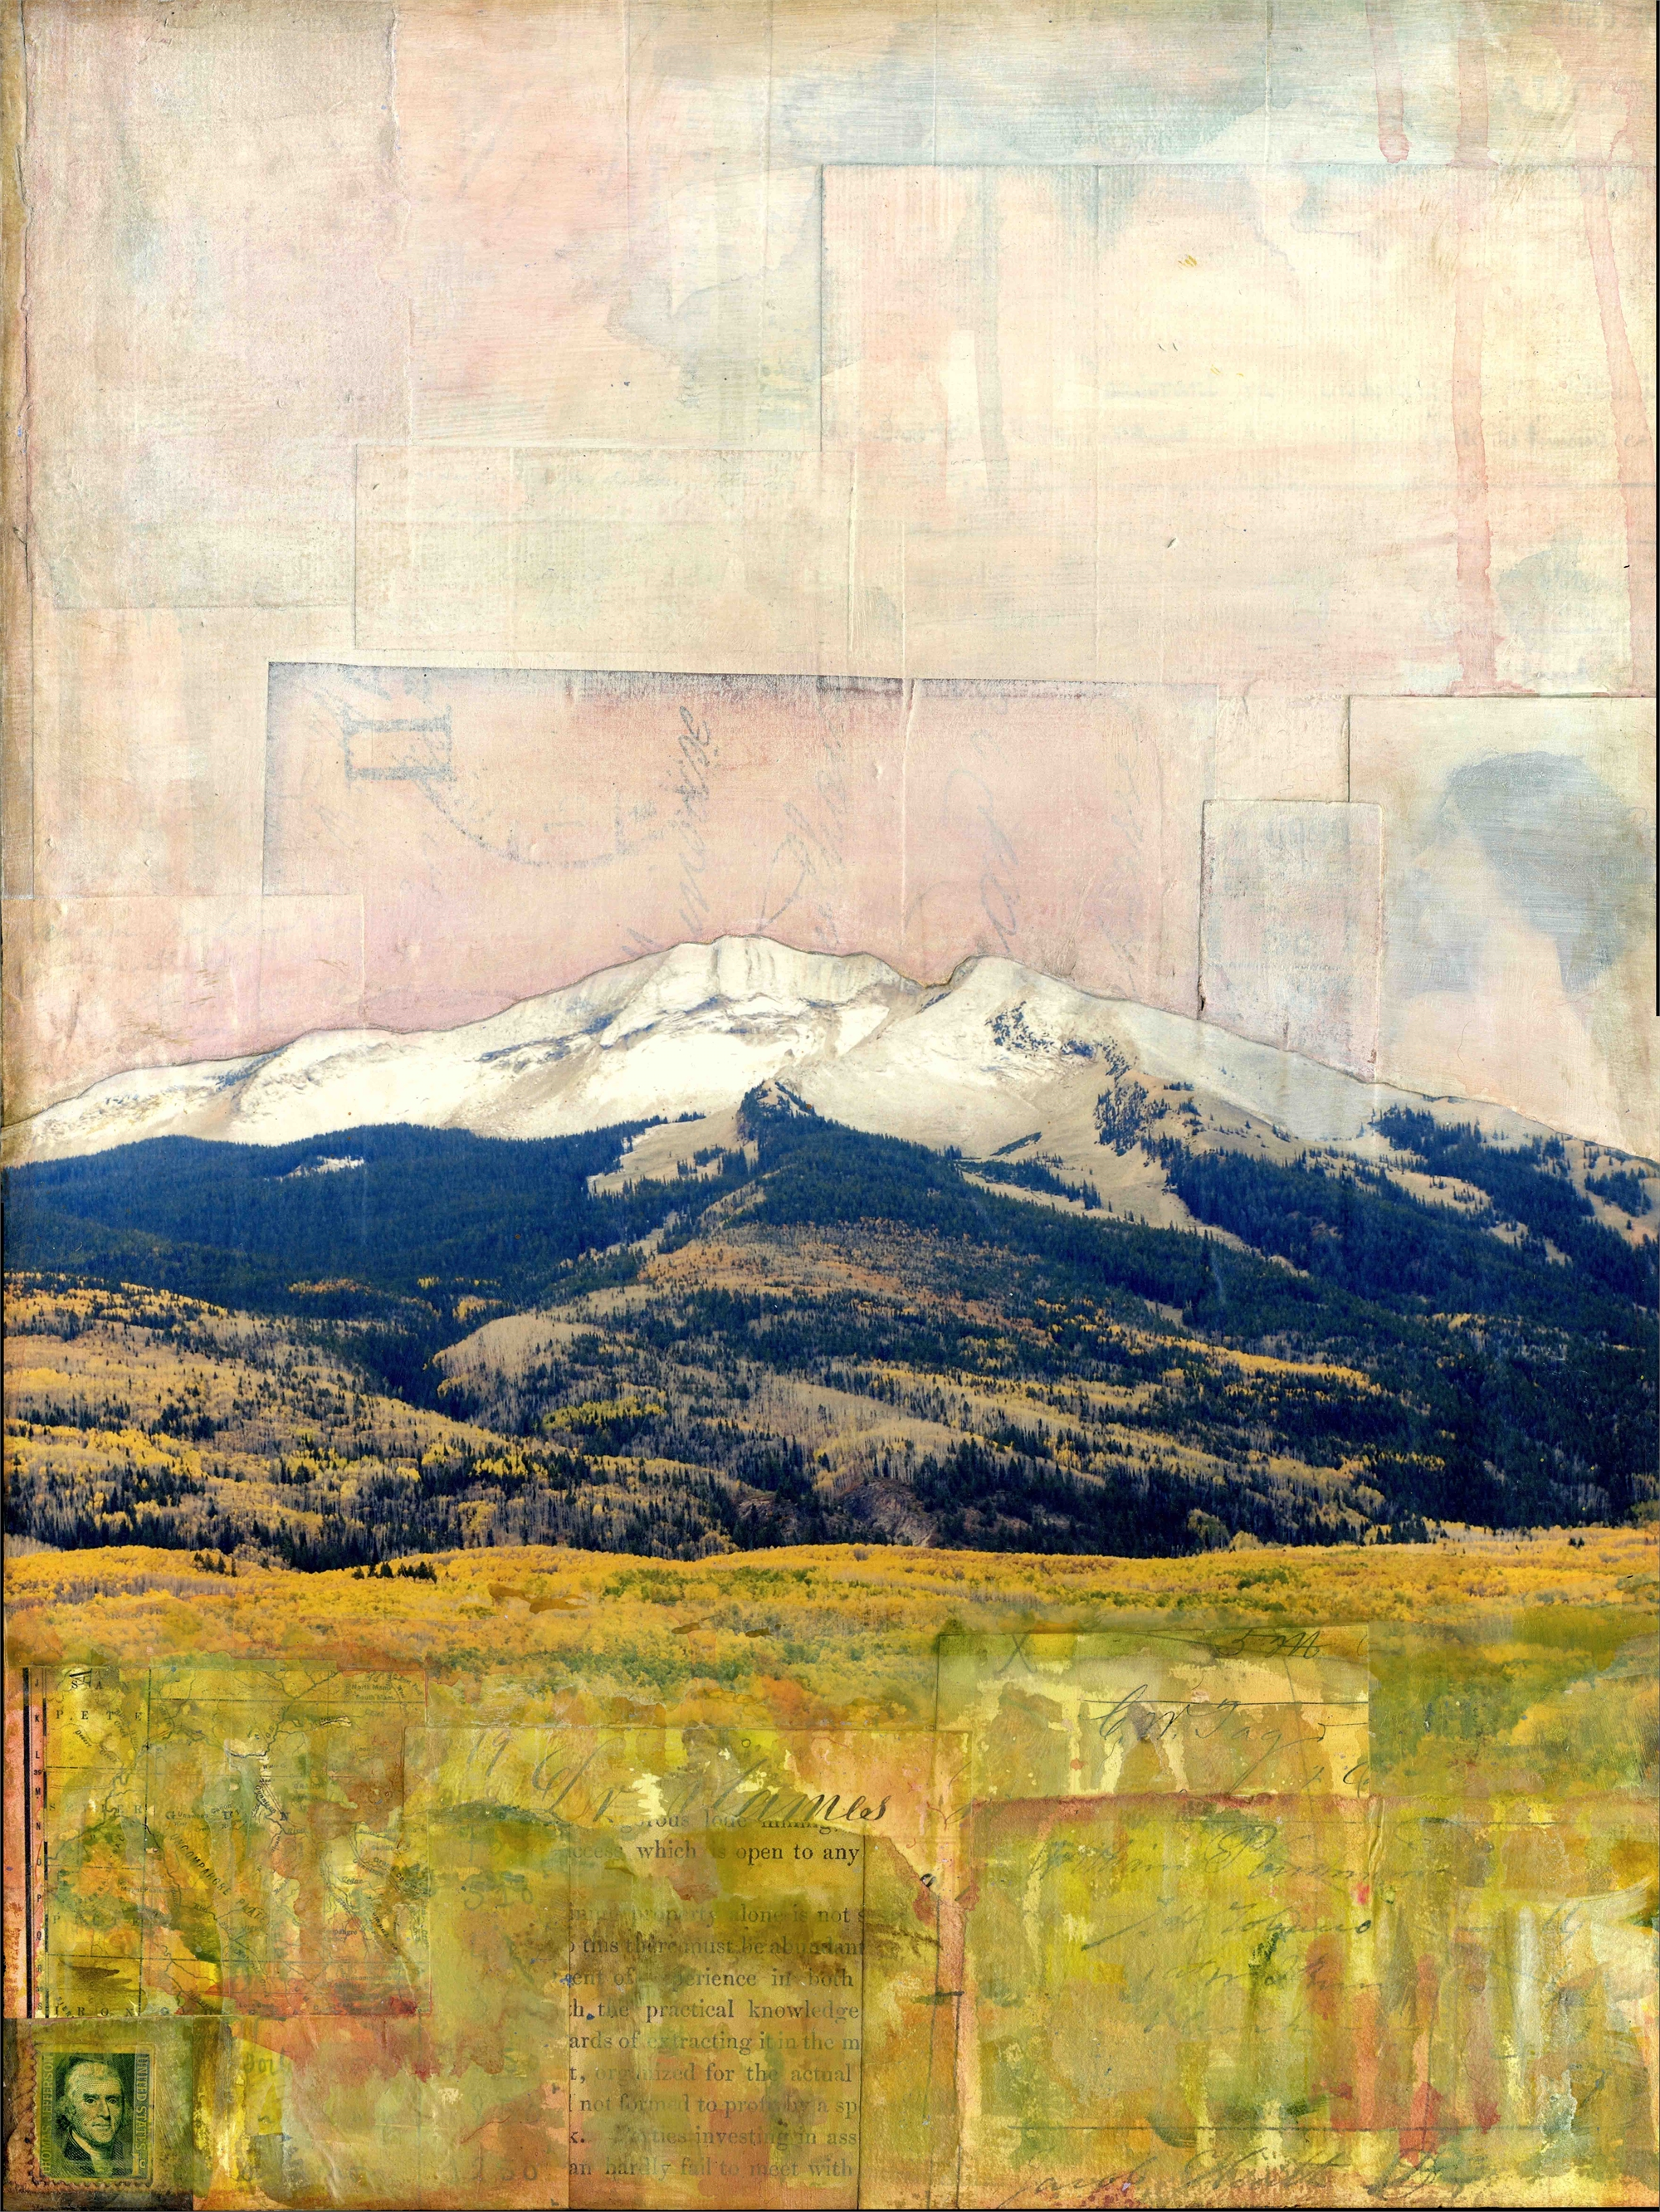 Kebler Pass by JC Spock